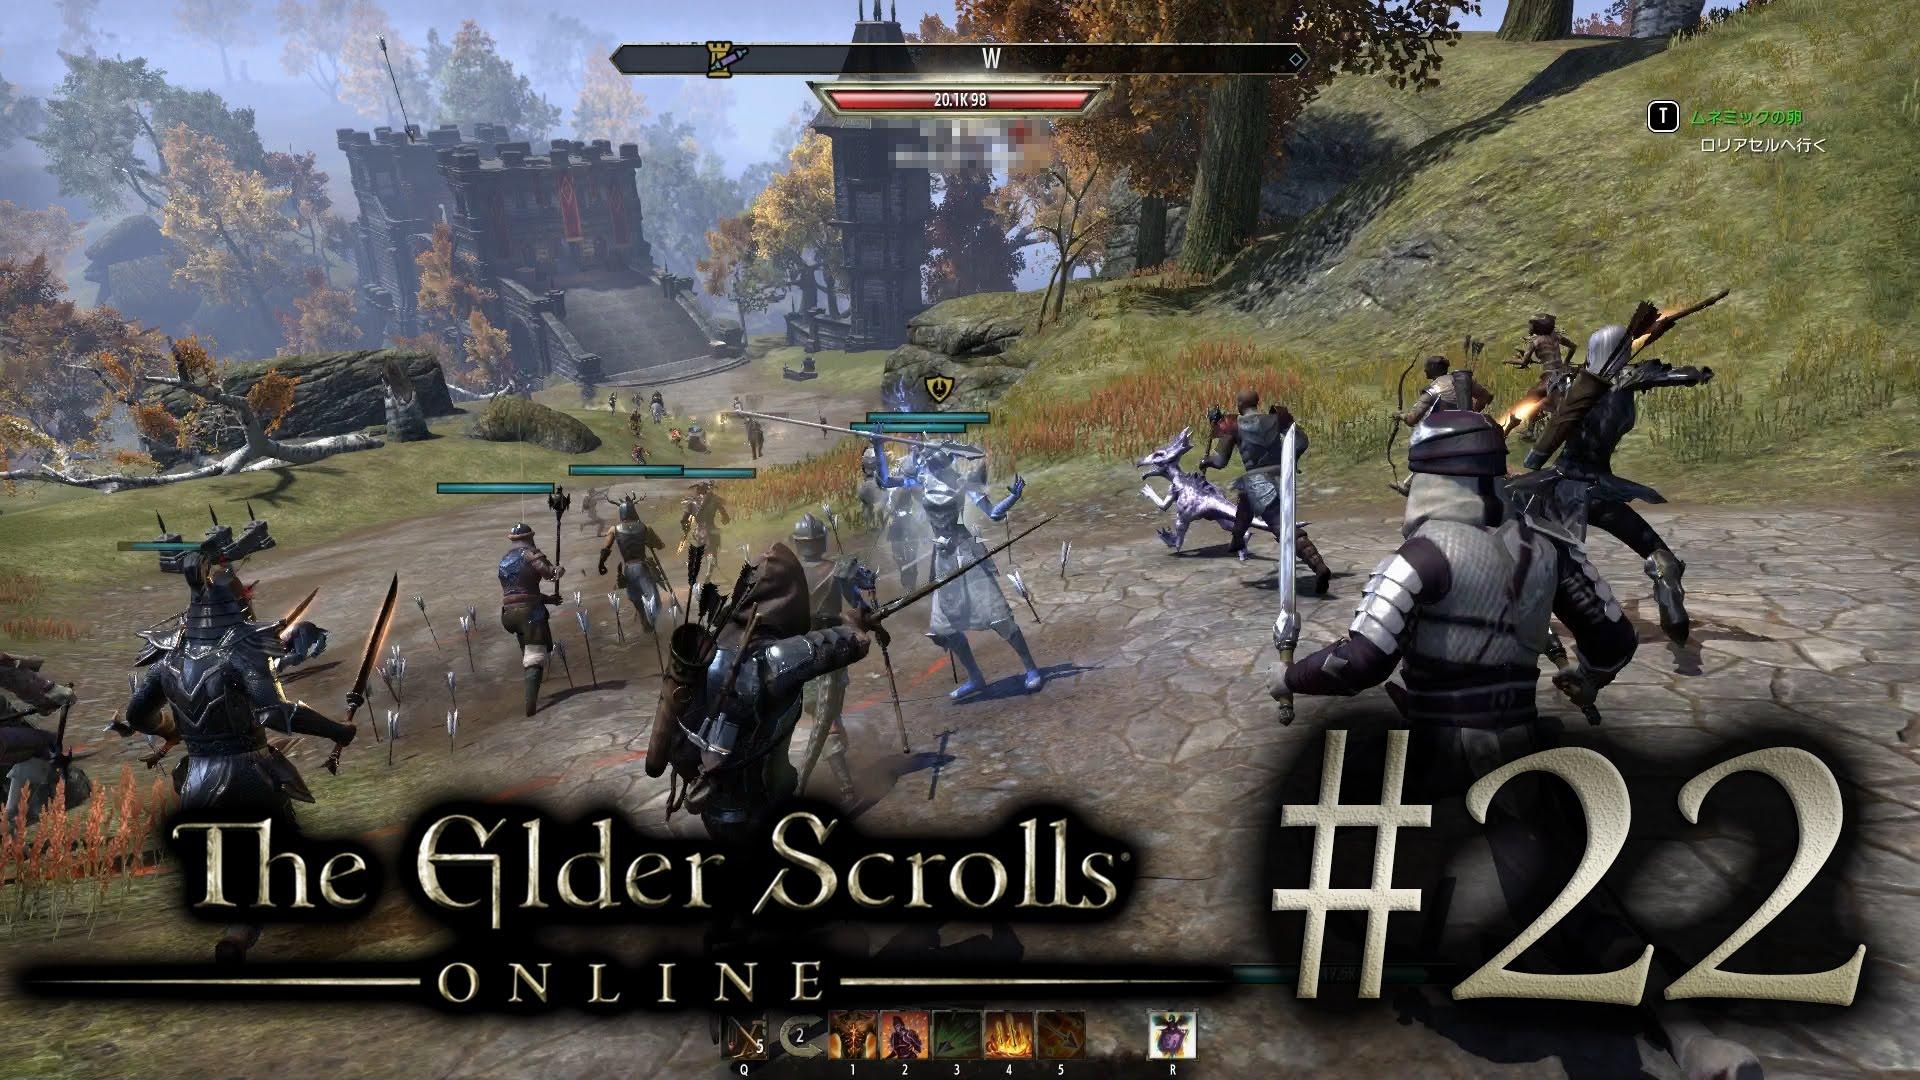 #22 The Elder Scrolls Online [エルダー・スクロールズ・オンライン]